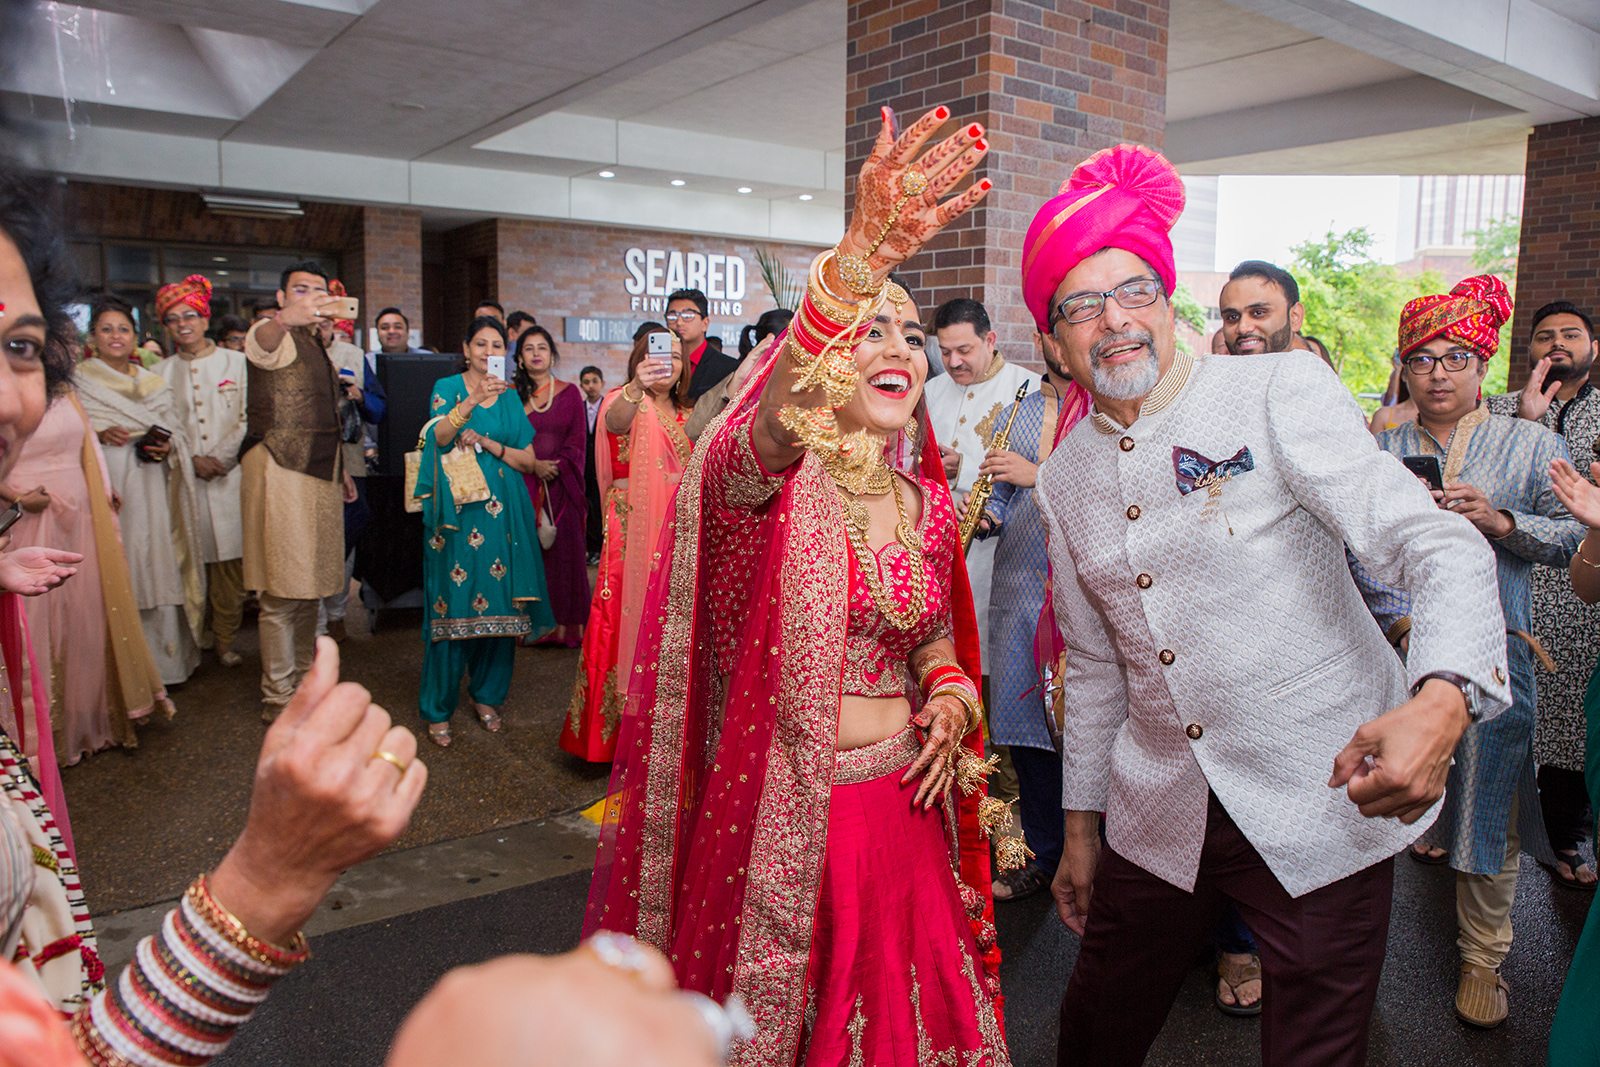 Le Cape Weddings - Sumeet and Chavi - Baraat --53.jpg